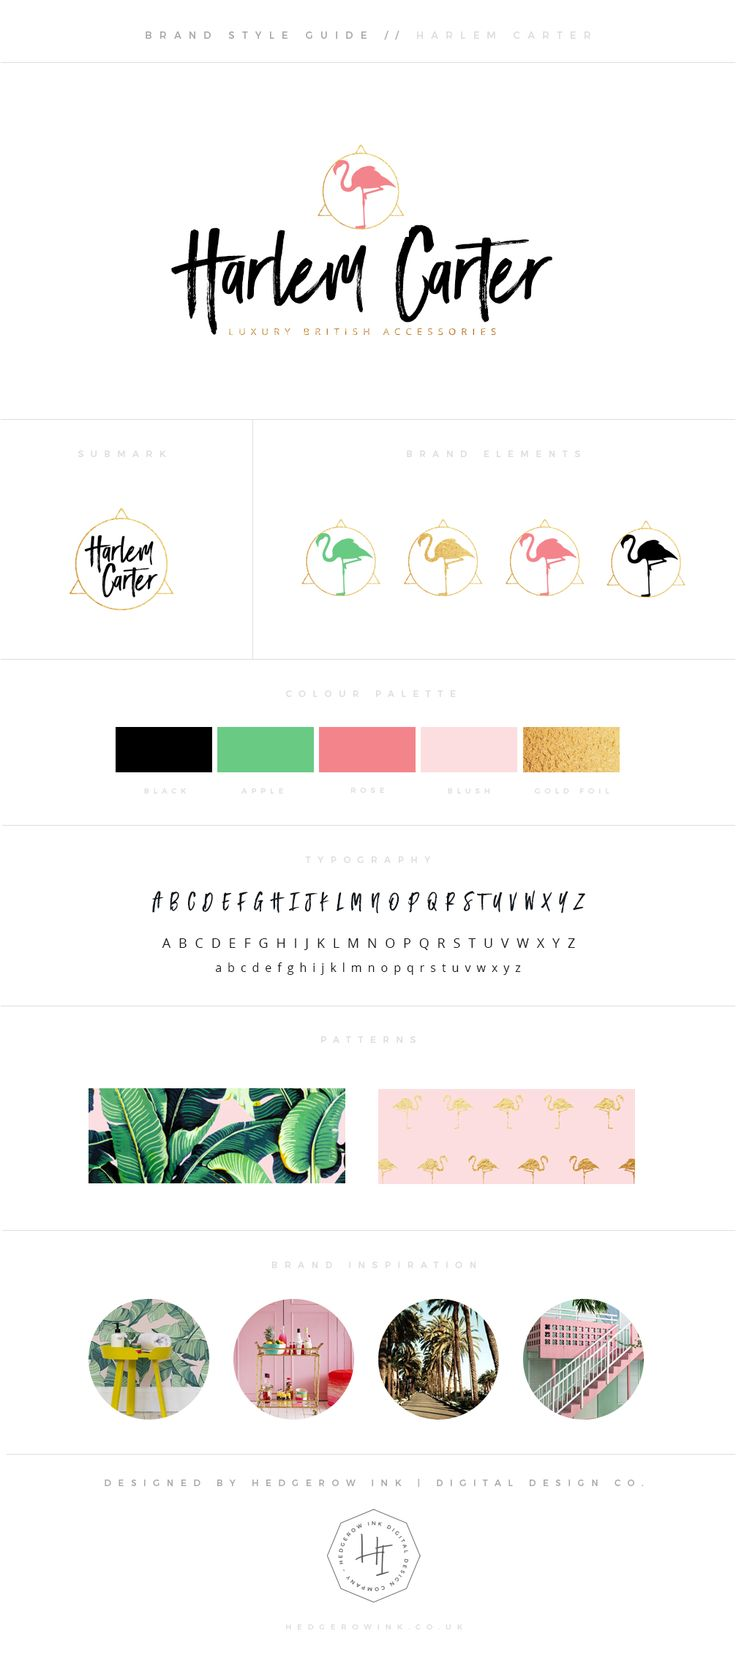 Hedgerow Ink | Digital Design Company | Web design & Branding for Female Entrepreneurs